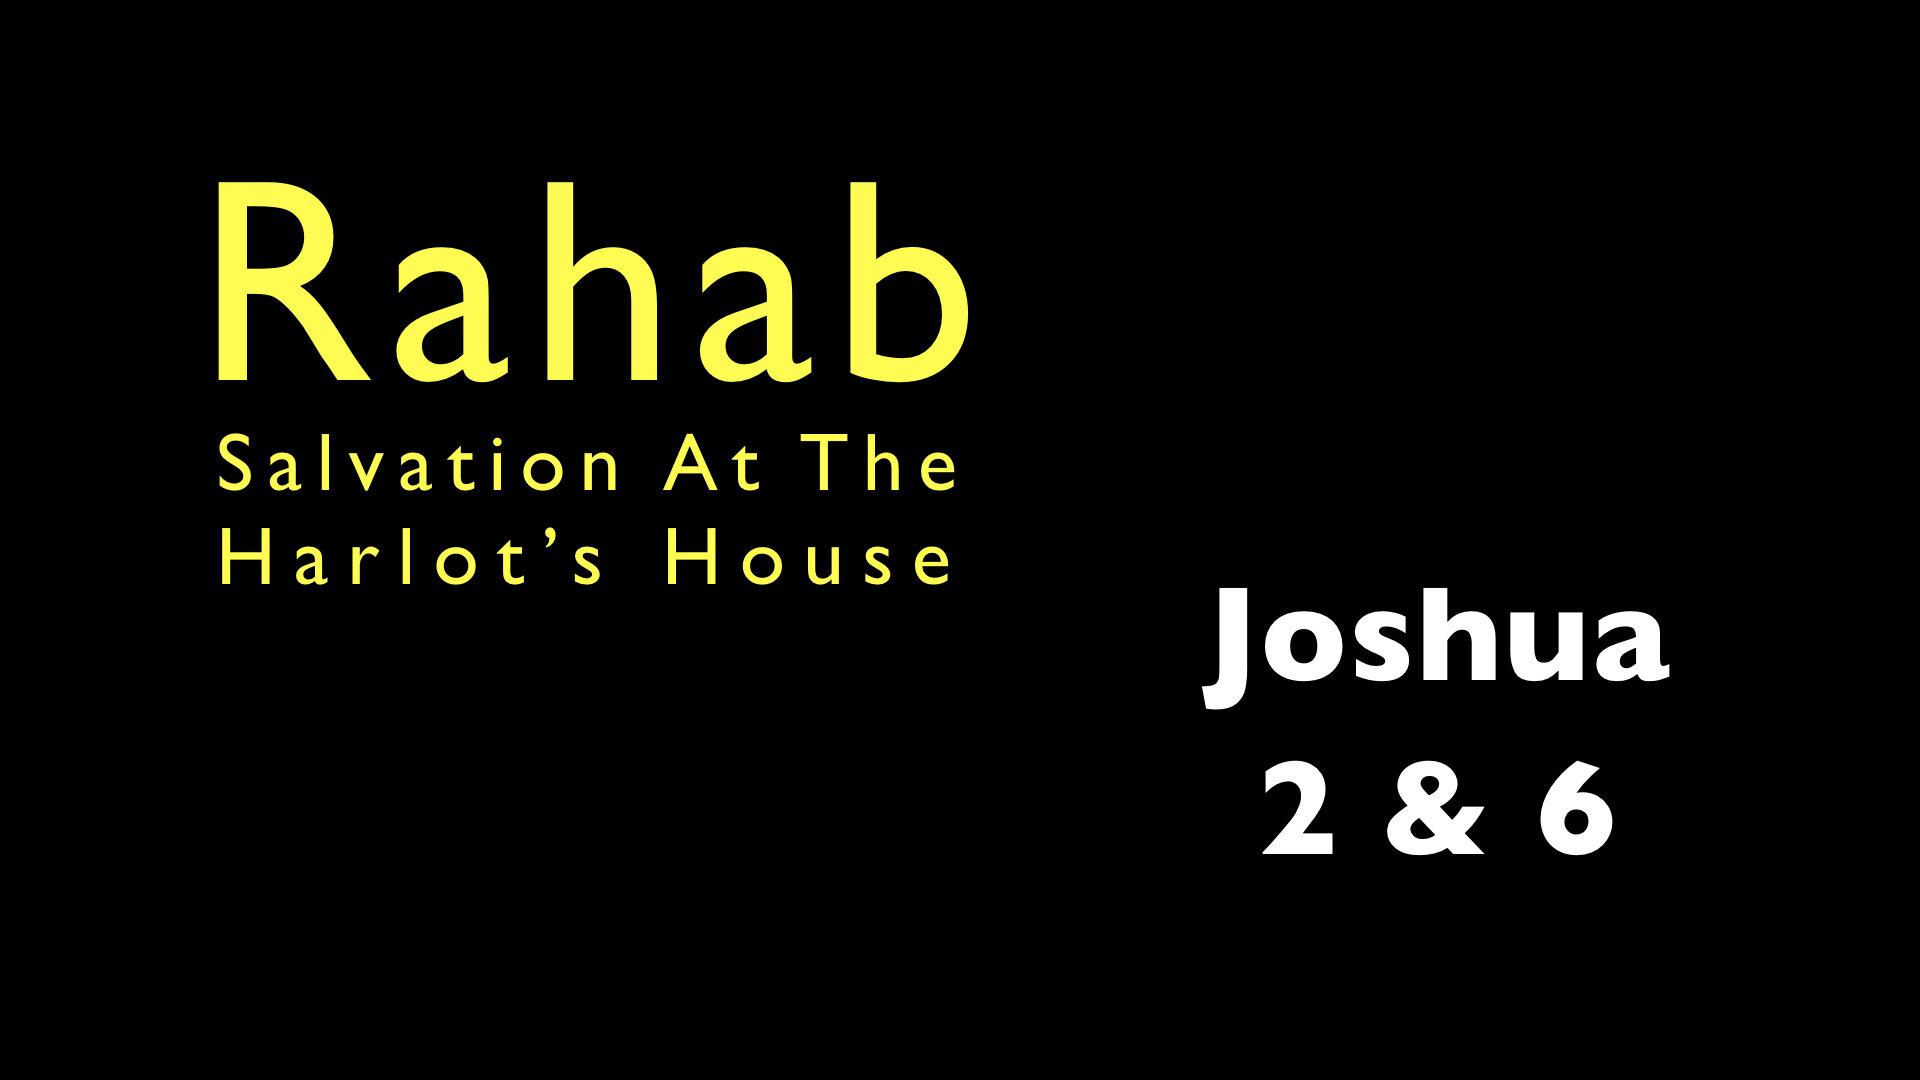 Rahab - Salvation at the Harlot's House WIDE.001.jpeg